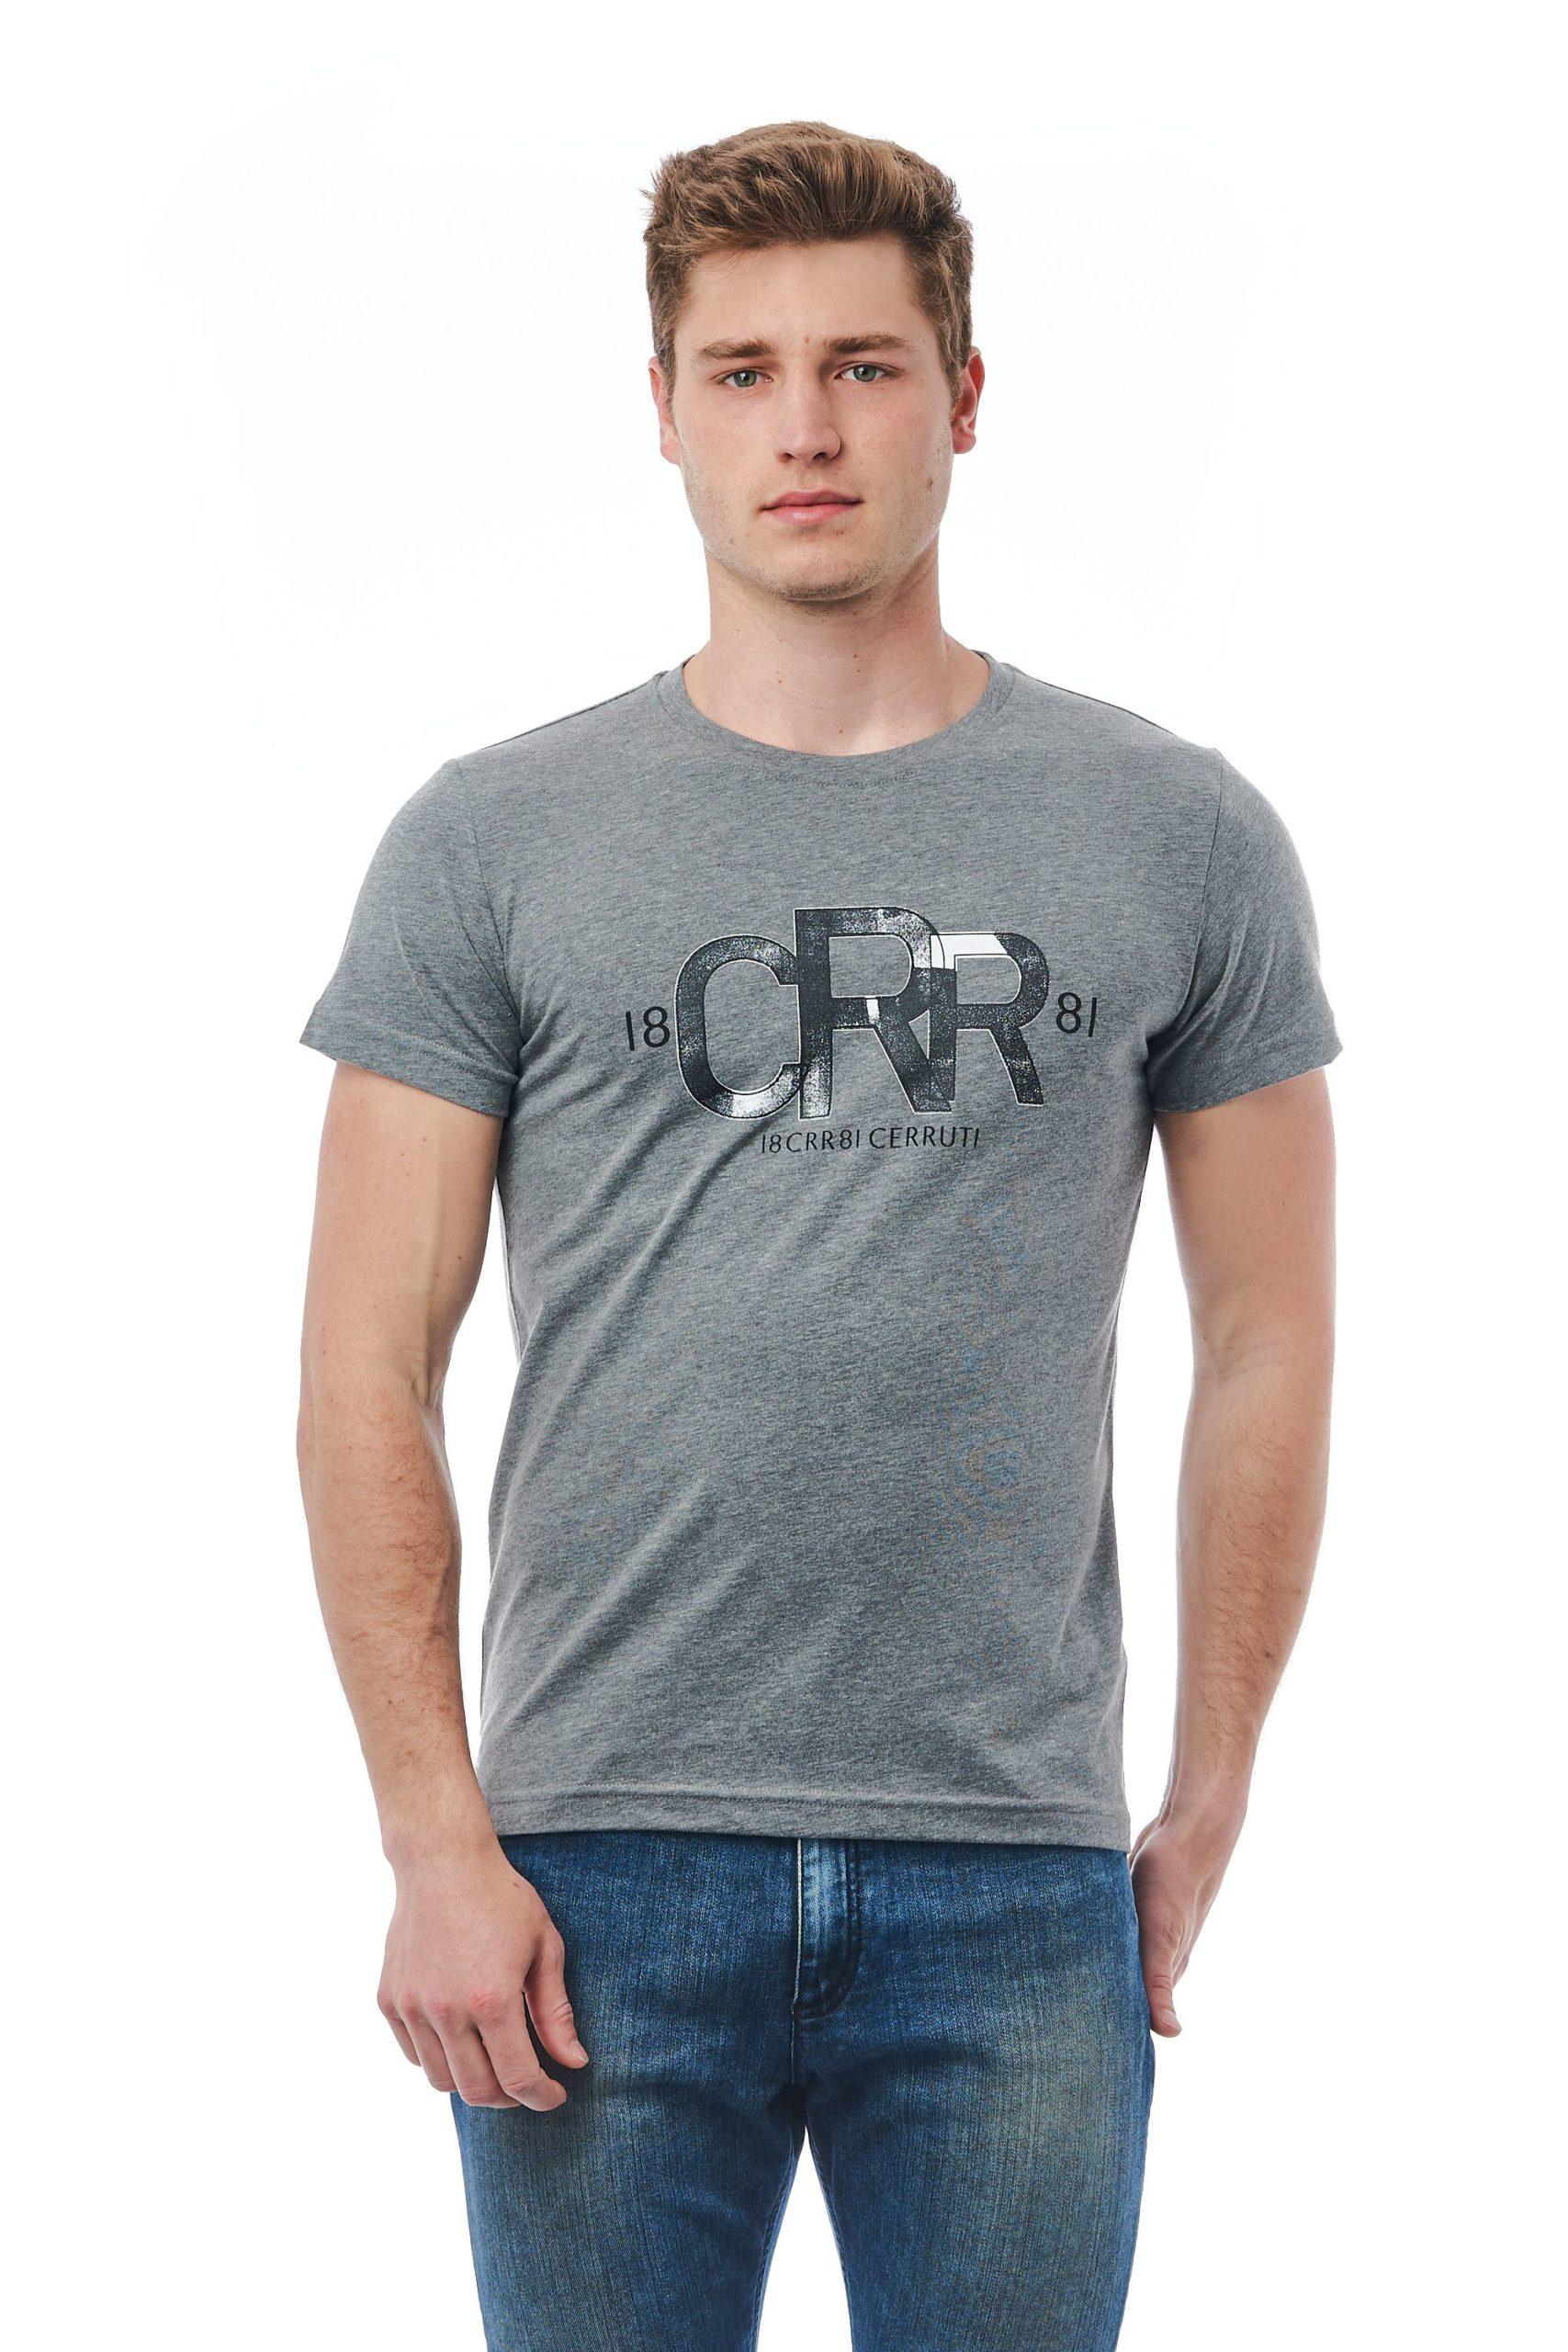 Cerruti 1881 Men's Gri Md Grey T-Shirt Gray CE1409880 - M